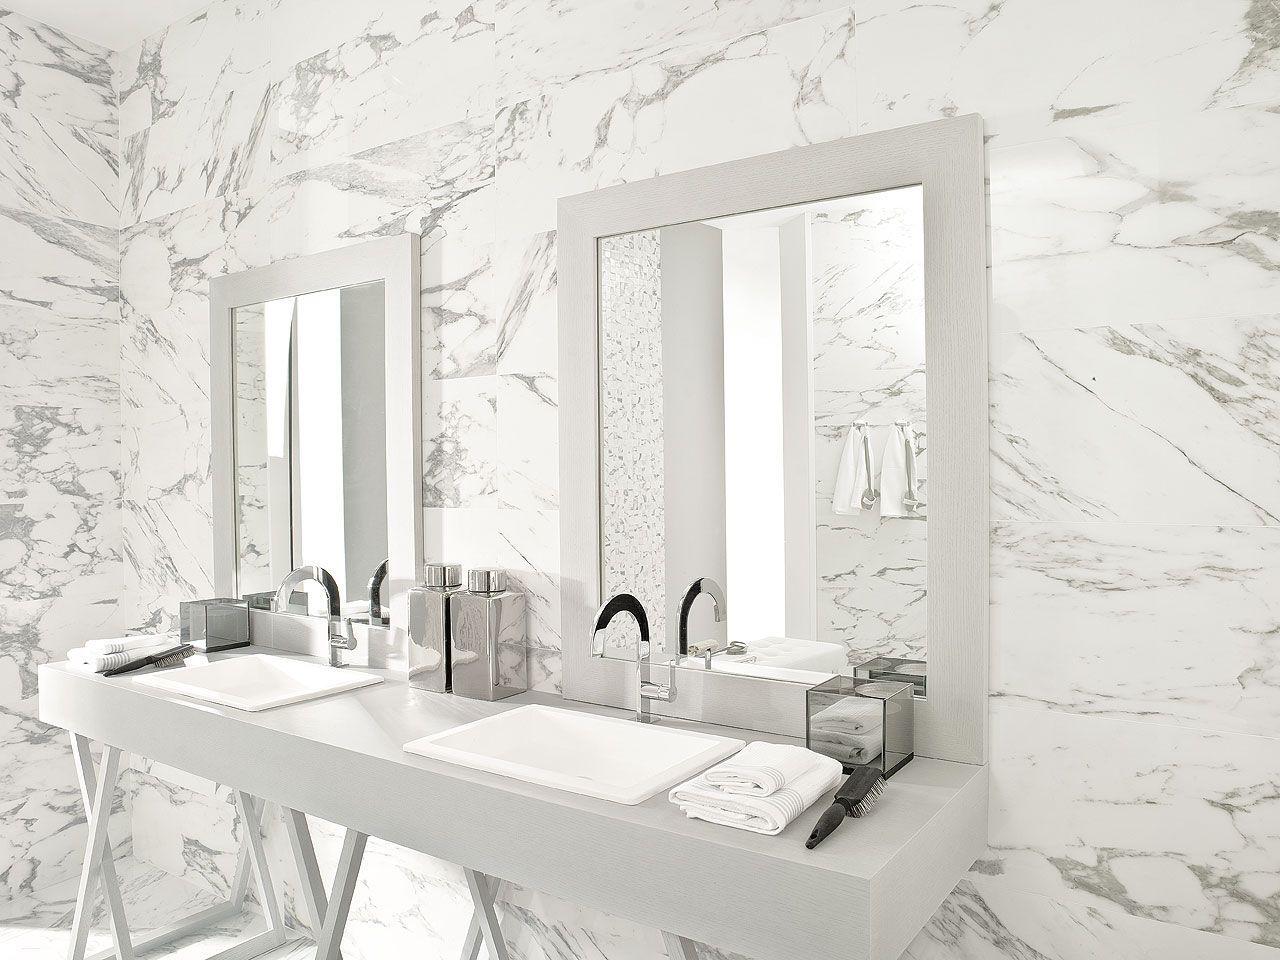 Bathroom Ceramic Wall Tile Marble Look CALACATA SILVER Part 88